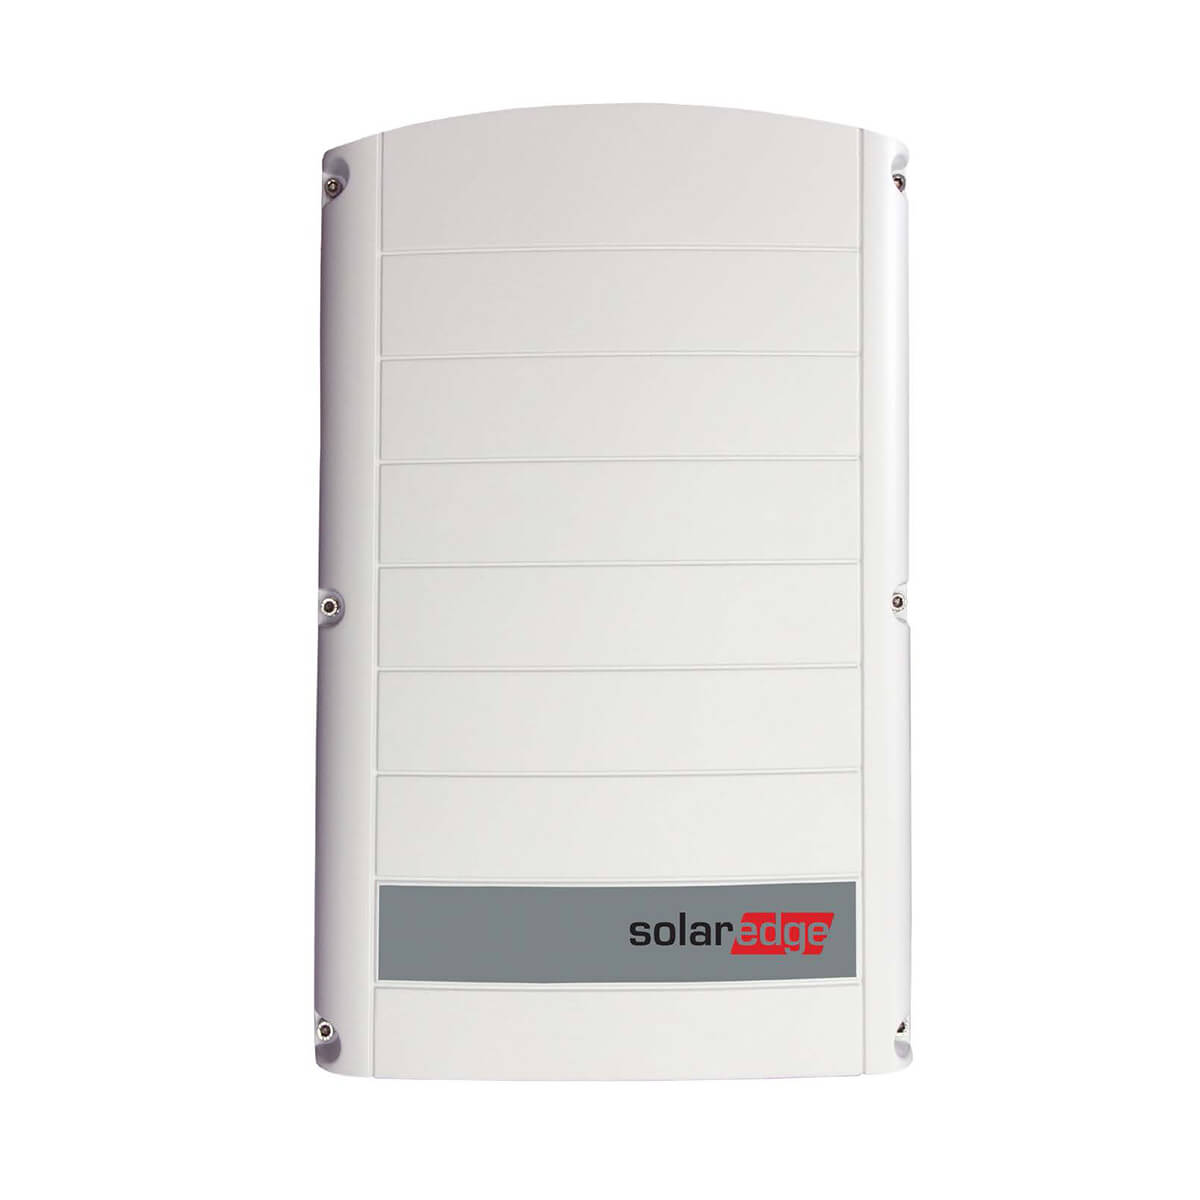 solaredge 6kW inverter, solaredge se6k 6kW inverter, solaredge se6k inverter, solaredge se6k, solaredge 6 kW, SOLAREDGE 6KW